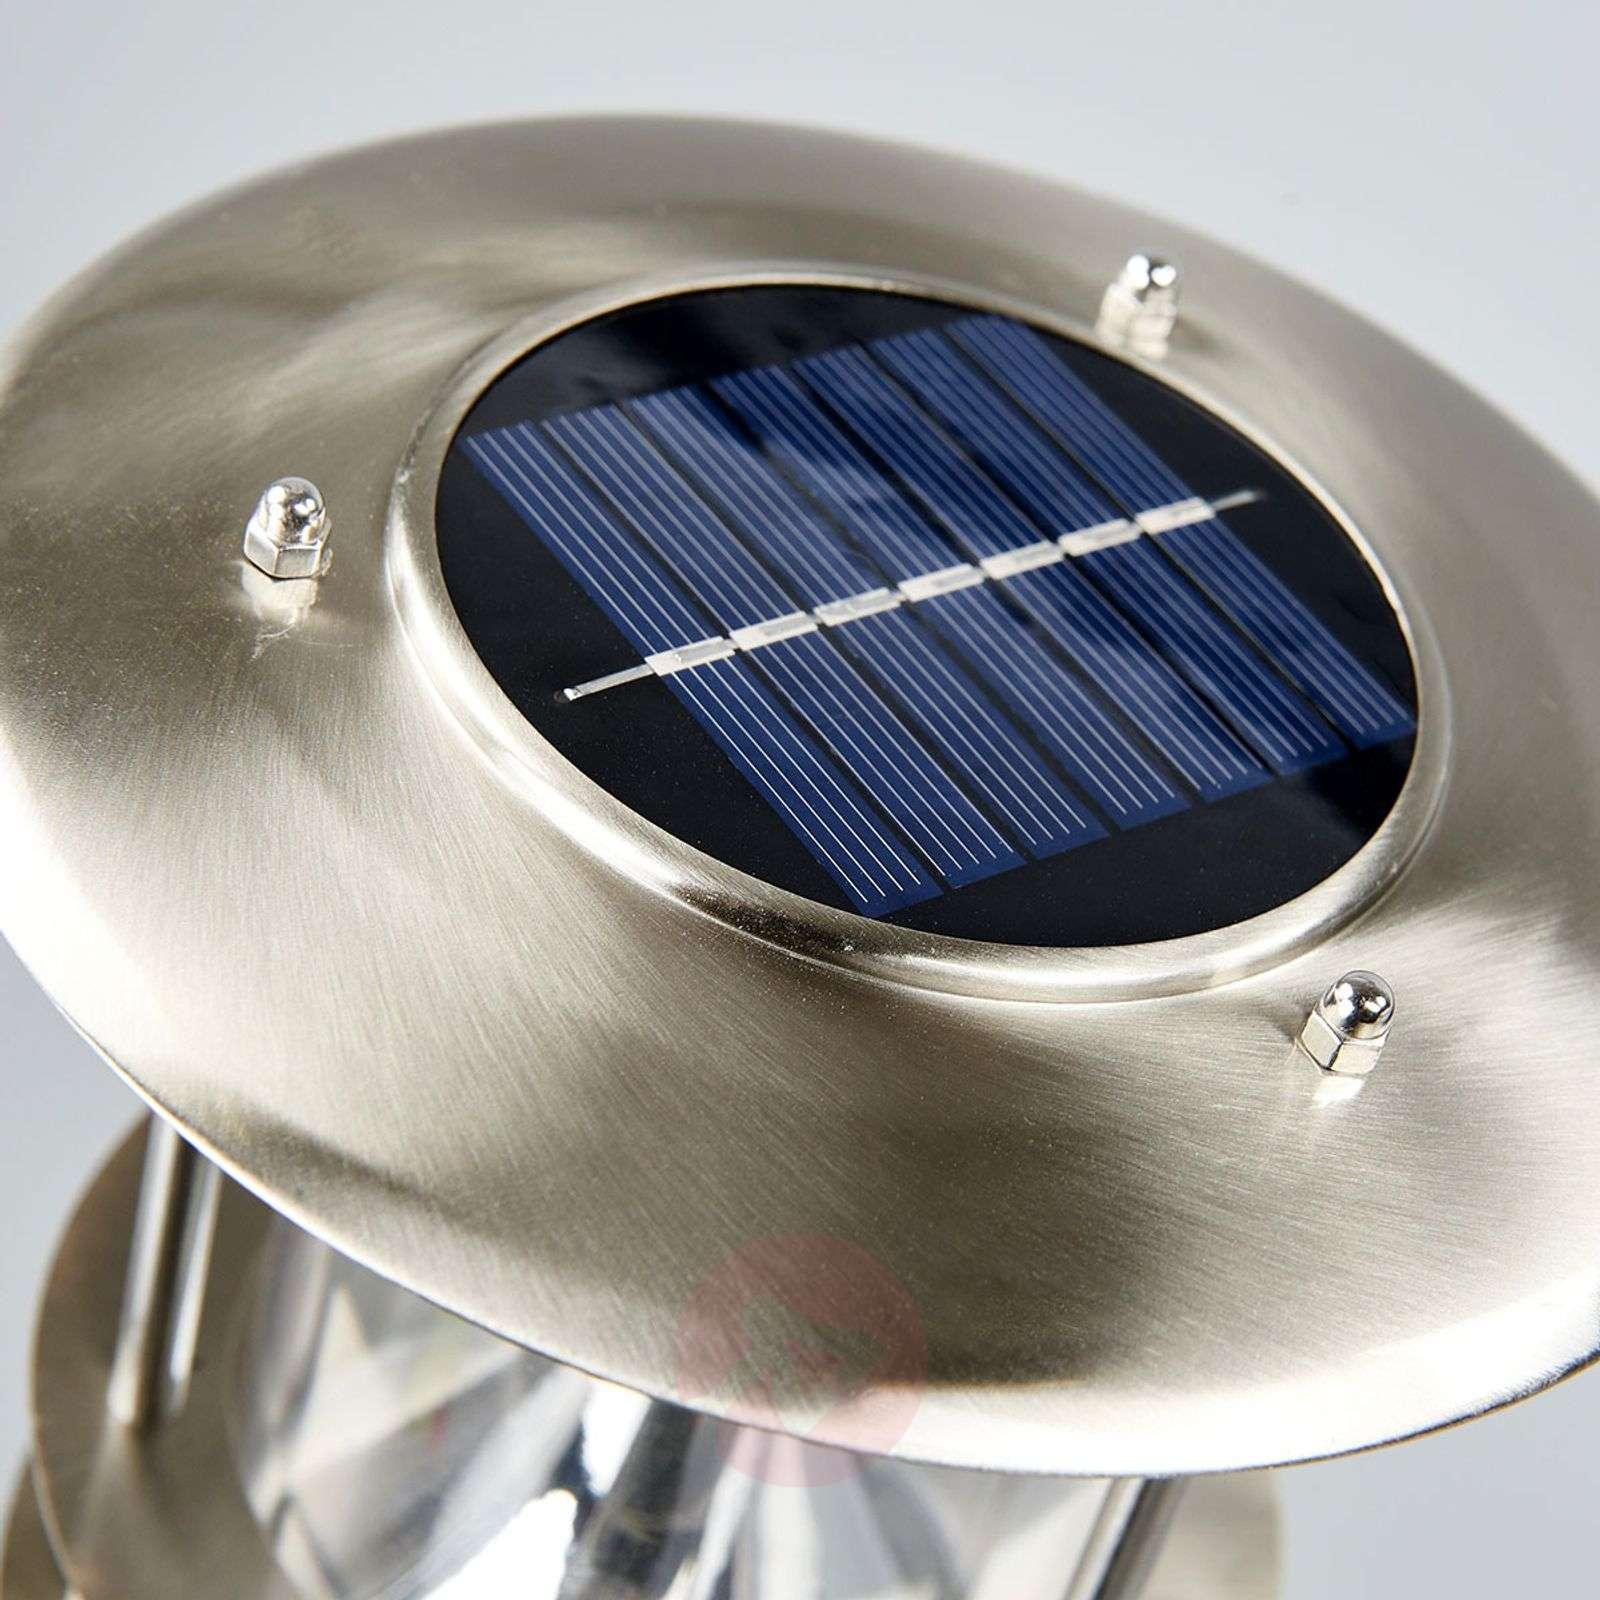 Sumaya – aurinkokäyt. LED-lamppu, ruost. teräs-9945284-01